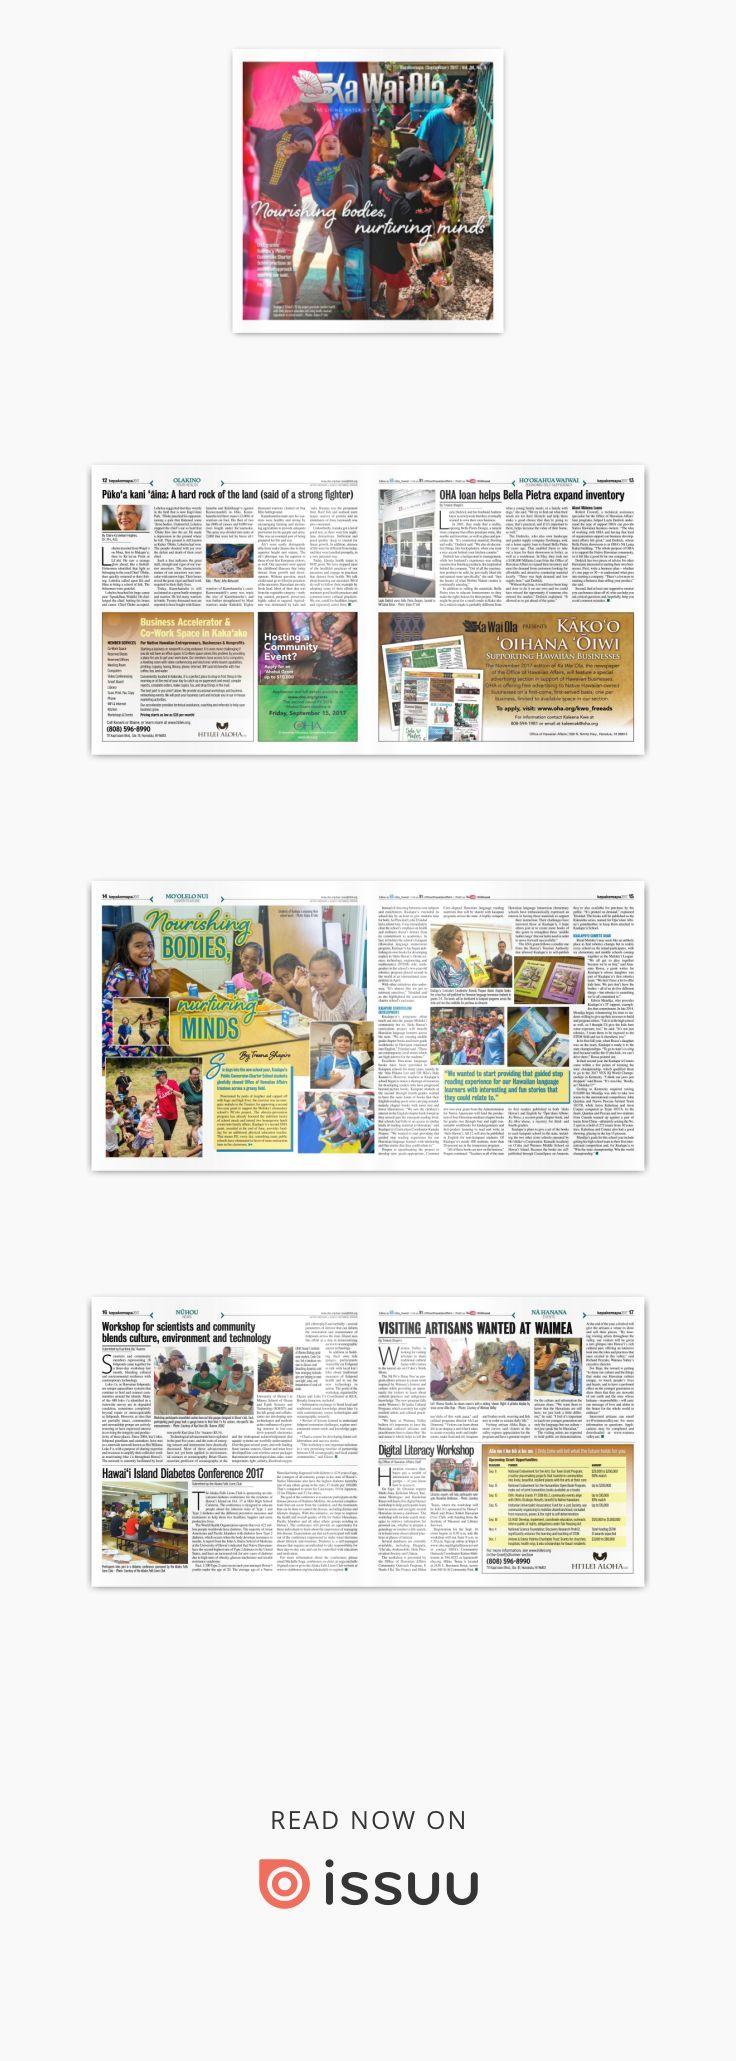 KWO - September 2017   Vol. 34, No. 9  Nourishing bodies, nurturing minds. OHA grantee Kualapu'u Conversion Charter School practices an innovative approach to teaching keiki.